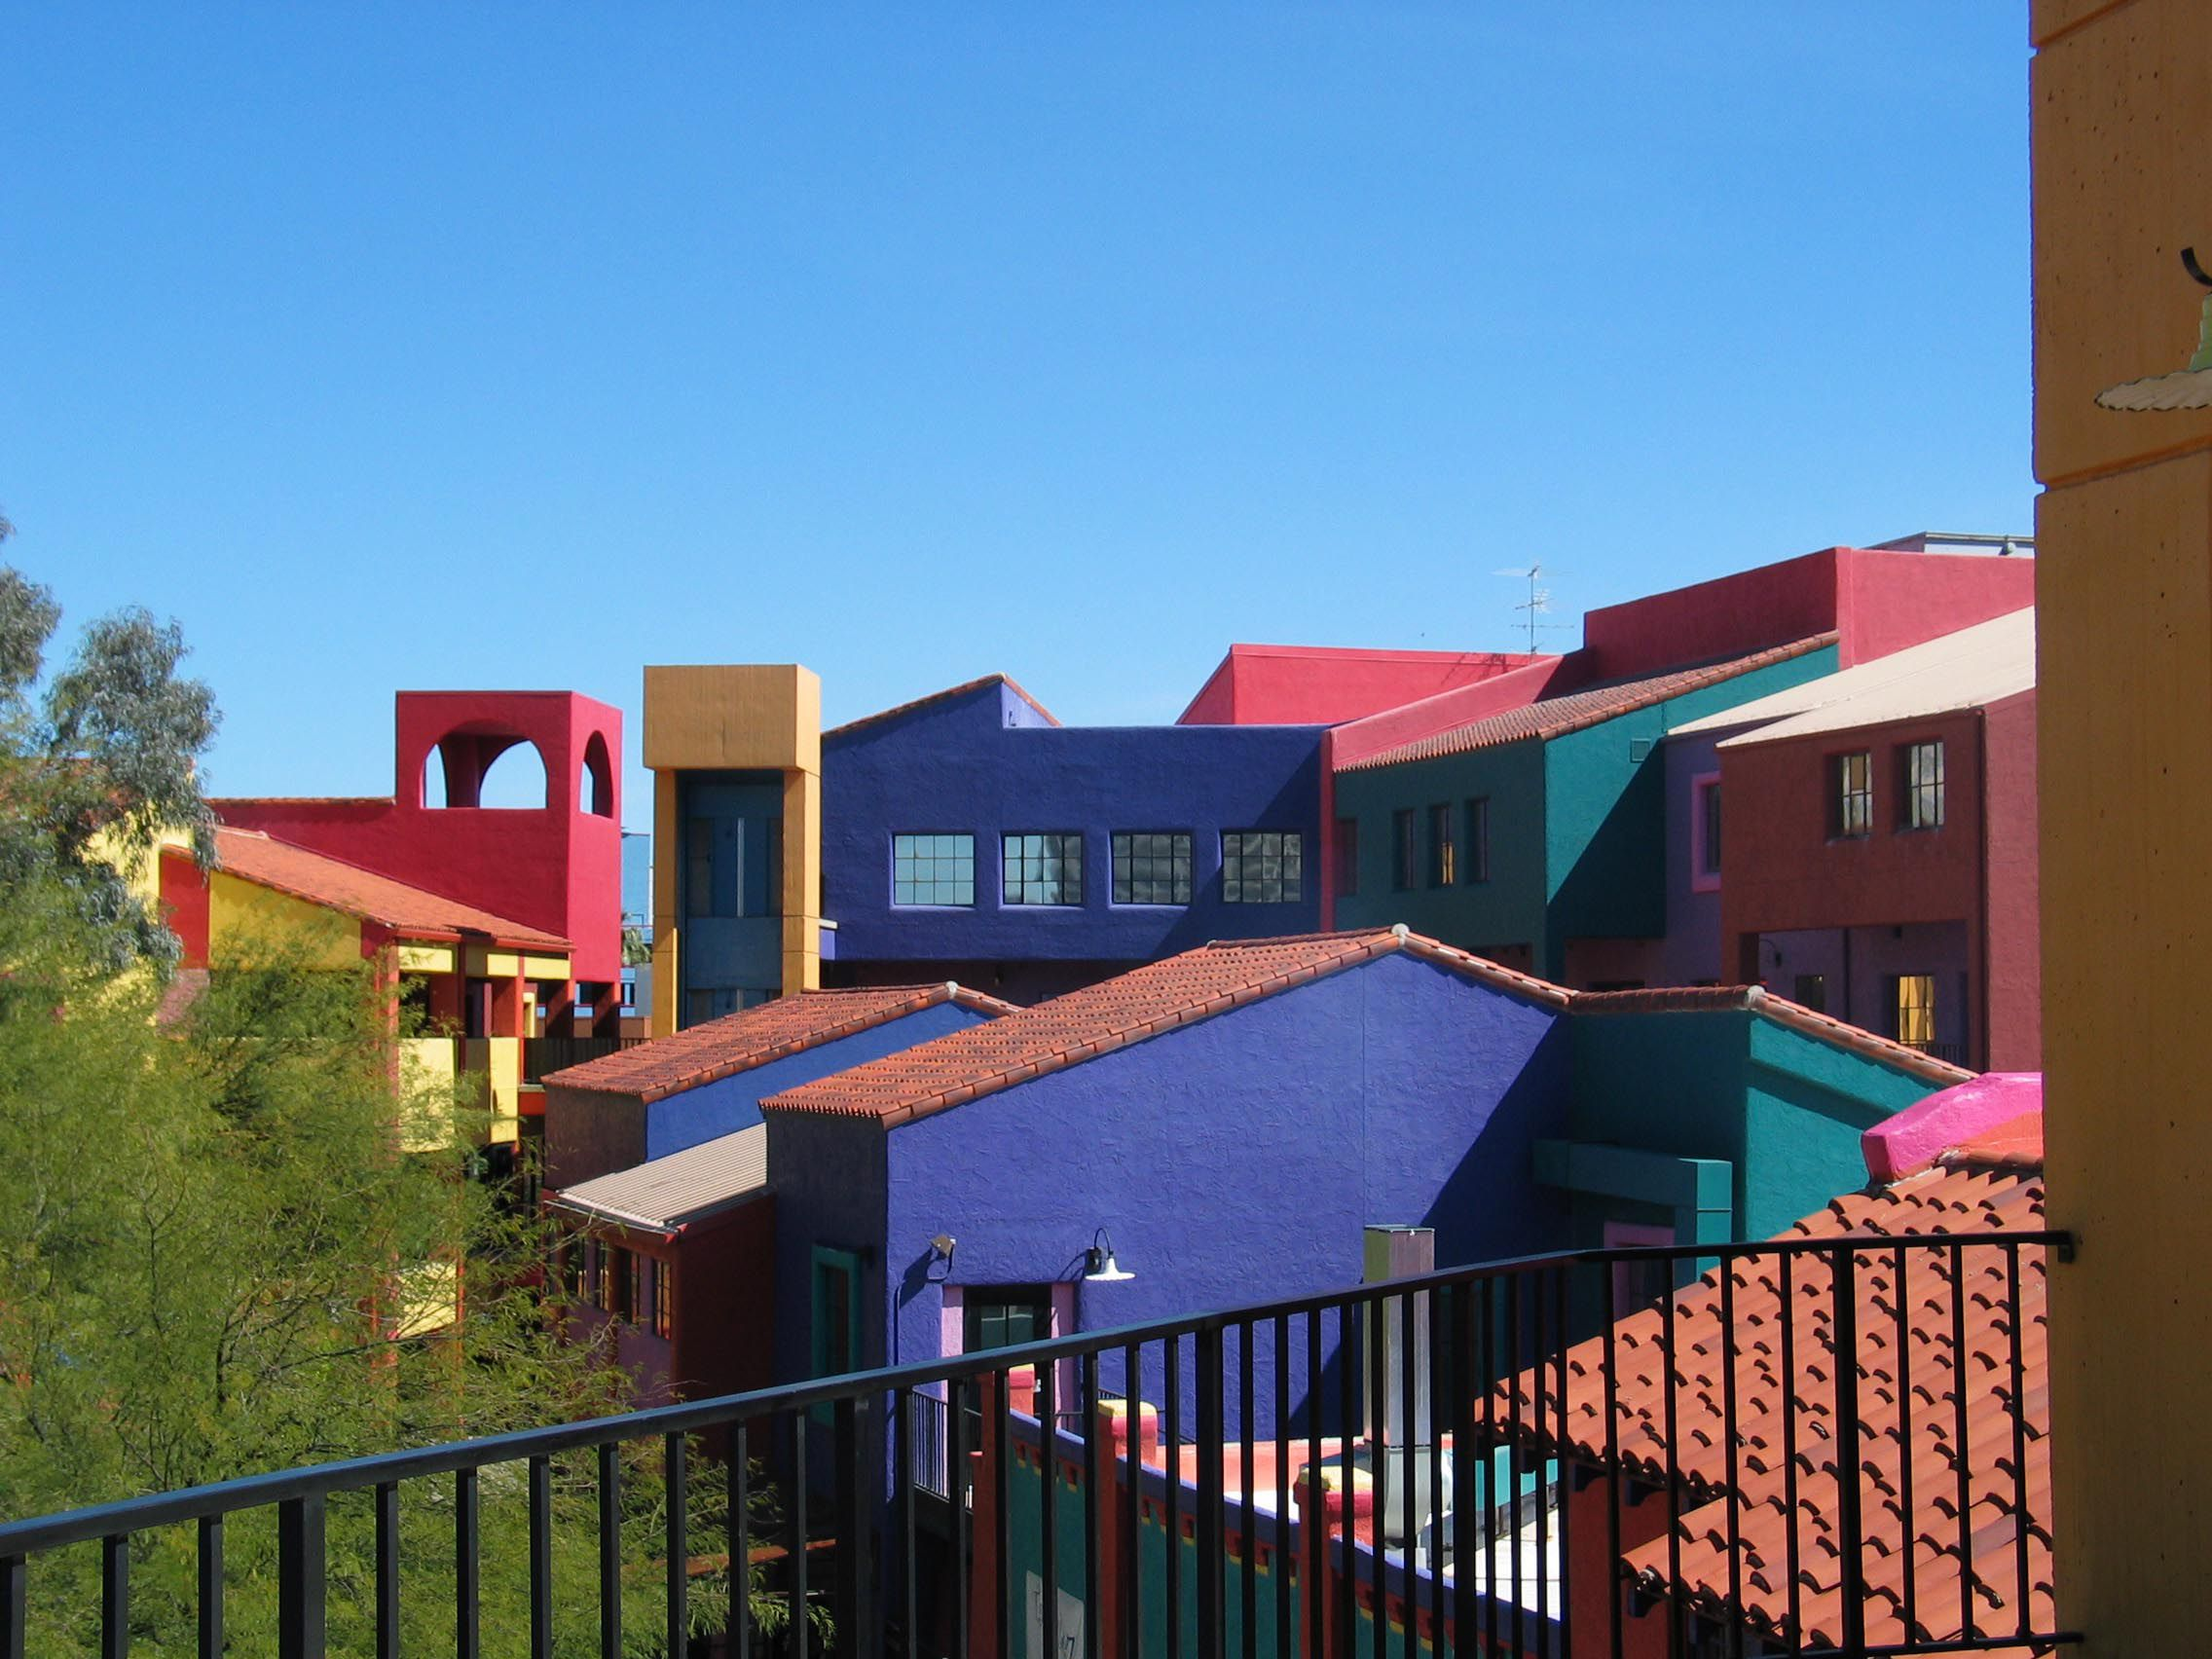 Free Photos Tucson Az Vista House Colourful Buildings Building